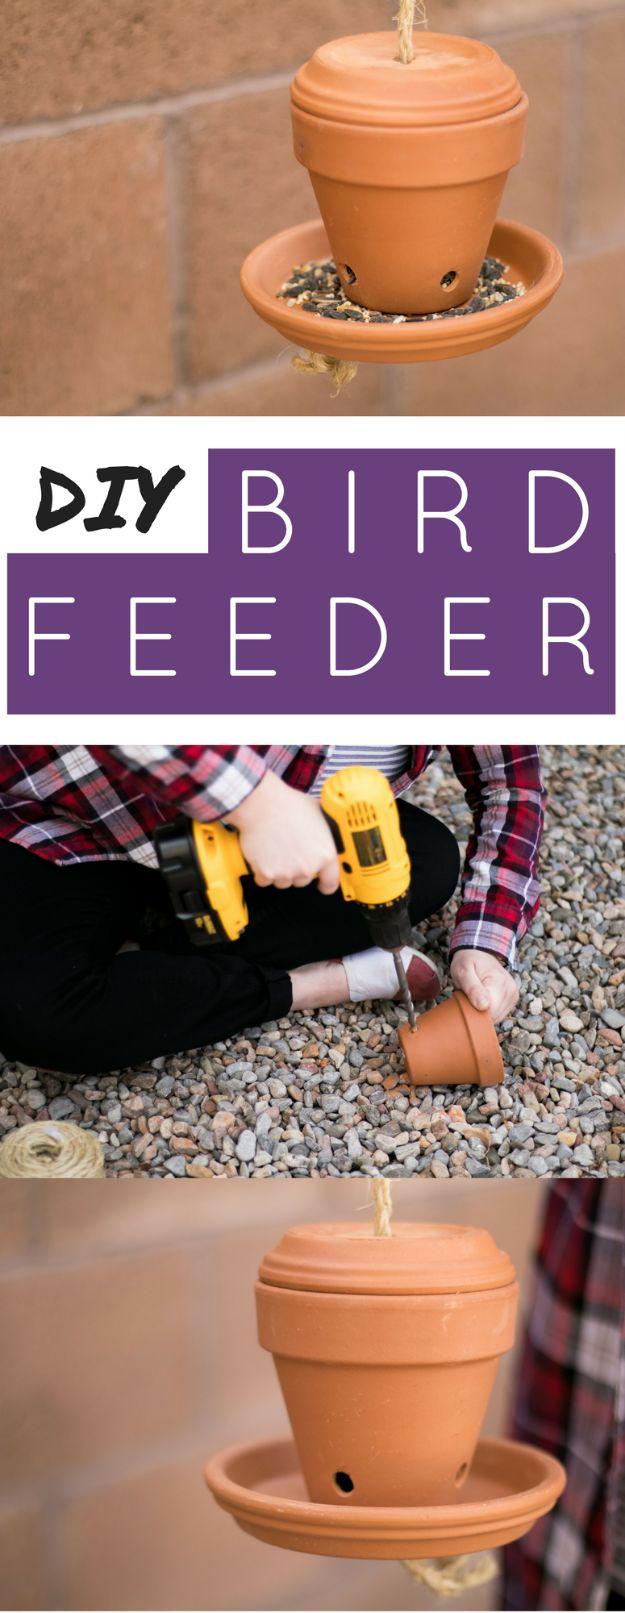 DIY Bird Feeders - DIY Bird Feeder For Songbirds - Easy Do It Yourself Homemade Bird Feeder Ideas from Mason Jar, Wooden, Wine Bottle, Milk Jug, Plastic, Dollar Store Supplies - Squirrel Proof, Unique and Creative Tutorials That Make Cool DIY Gifts #diyideas #birds